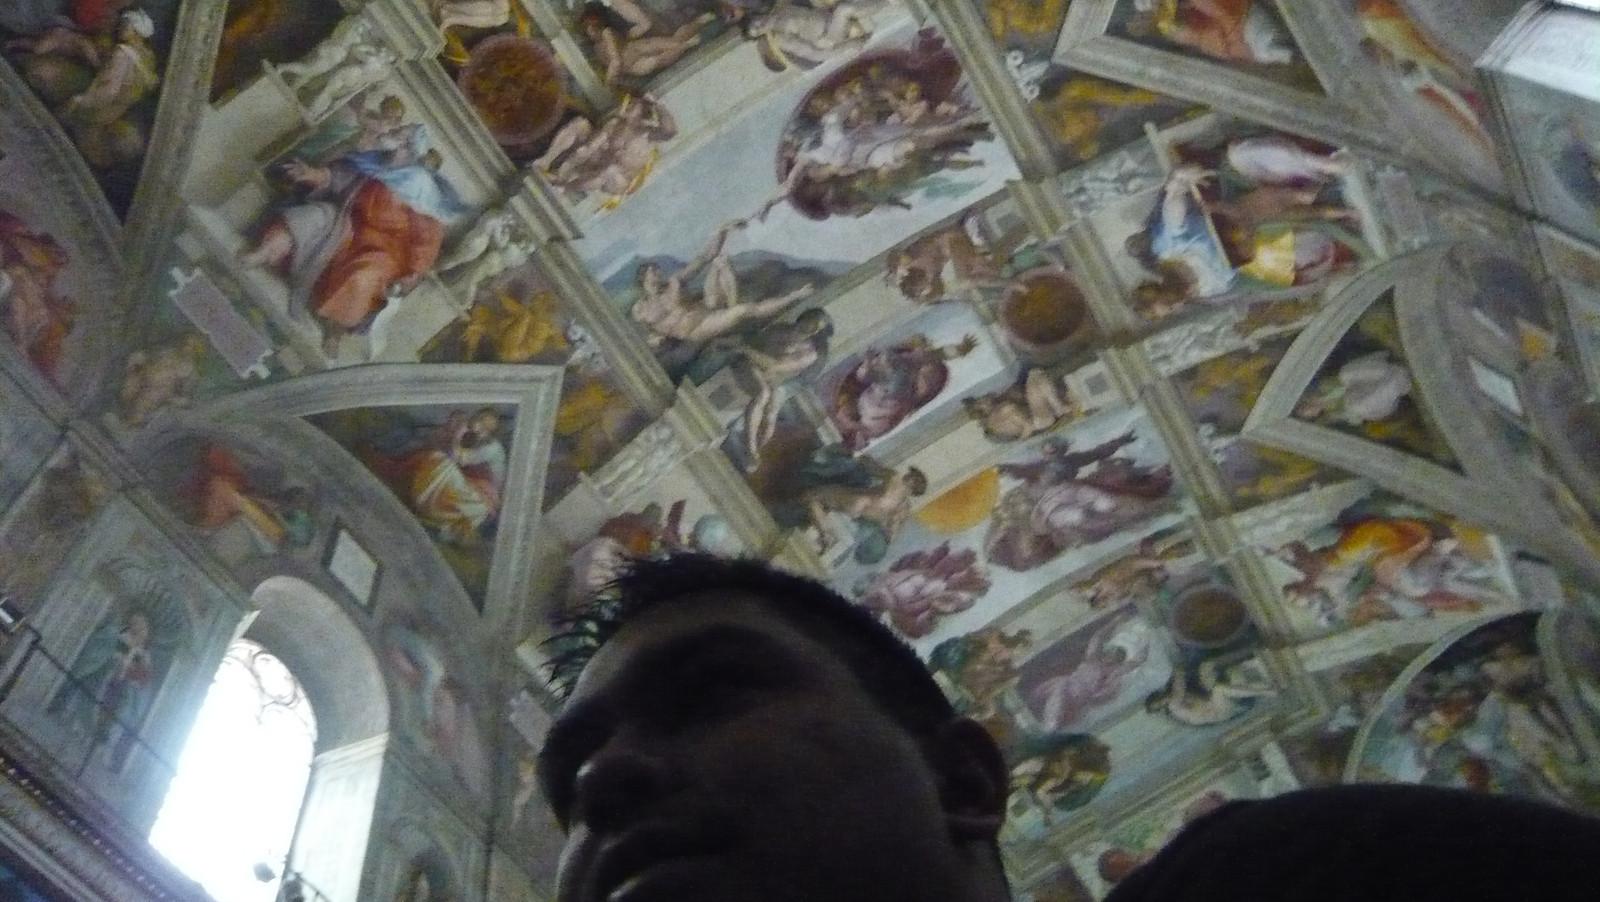 "38. Sistine Chapel<br /> <br /> Vatican Galleries<br />  <a href=""http://rishiray.smugmug.com/gallery/5049642_ouJbp"">http://rishiray.smugmug.com/gallery/5049642_ouJbp</a><br /> <br /> Hillman Wonders Page<br />  <a href=""http://www.hillmanwonders.com/sistine_chapel/sistine_chapel.htm"">http://www.hillmanwonders.com/sistine_chapel/sistine_chapel.htm</a>"